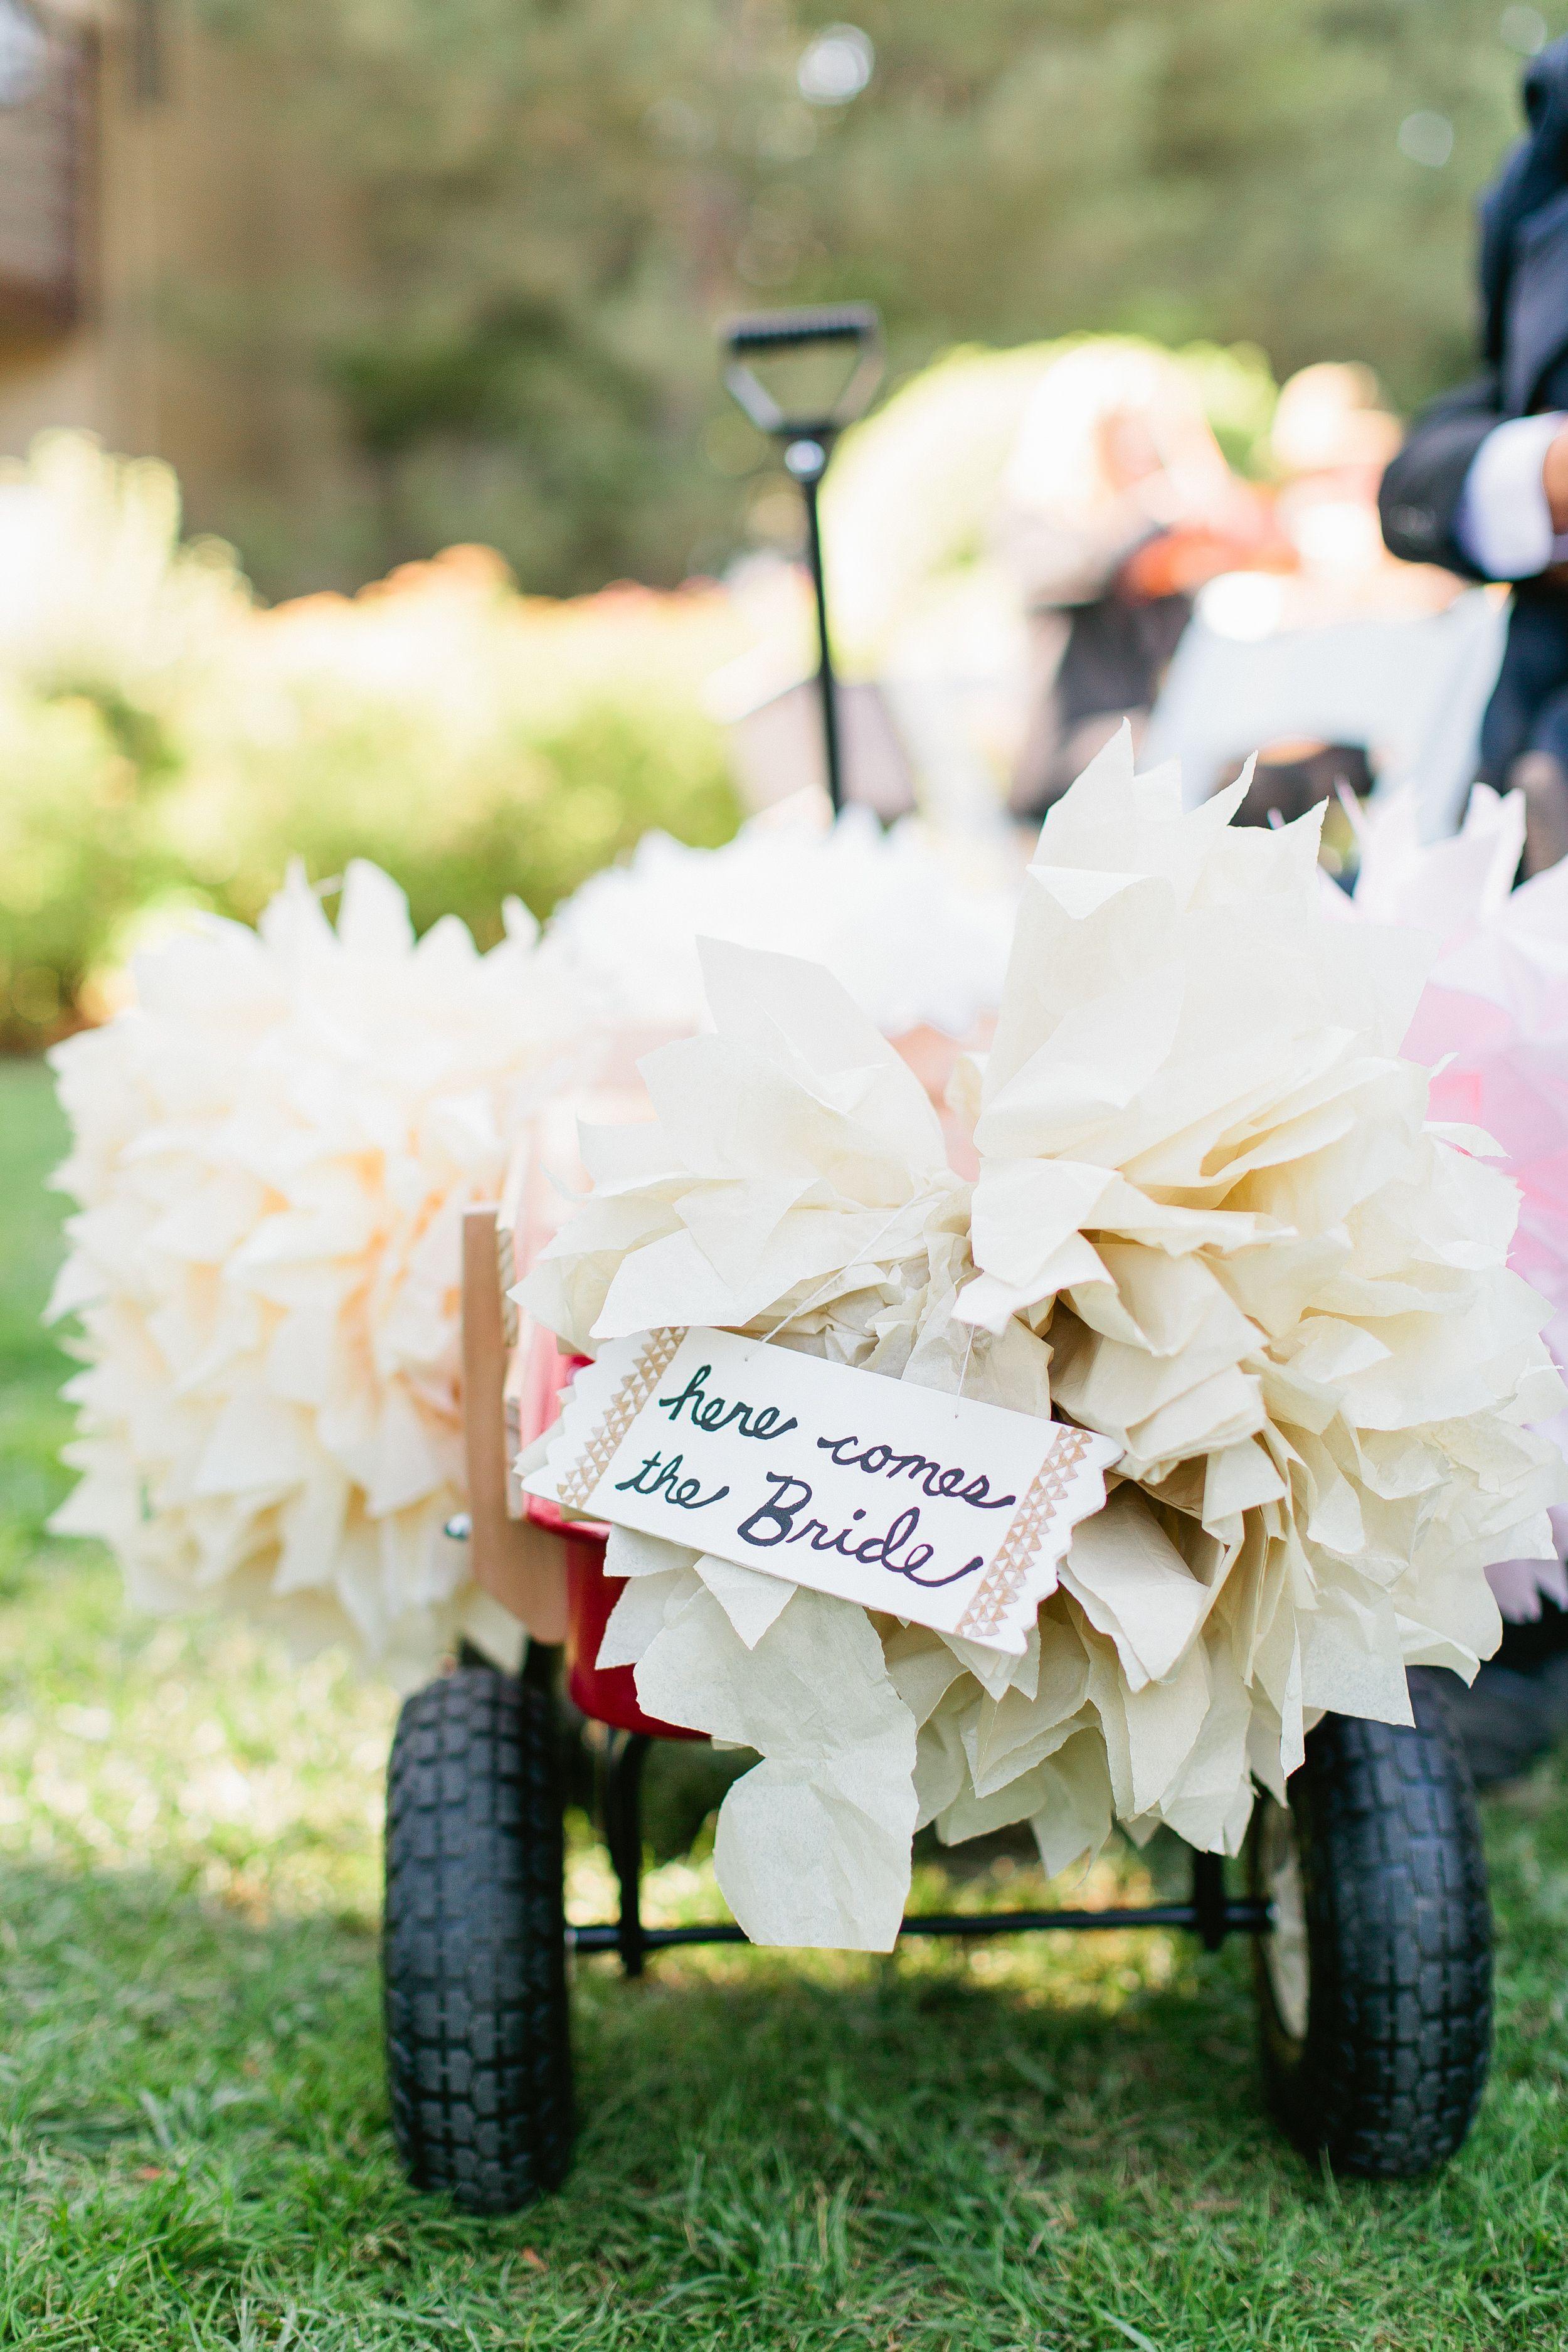 Desktop diy wedding wagon of iphone high quality wagon for the baby ring bearer bridesmaids